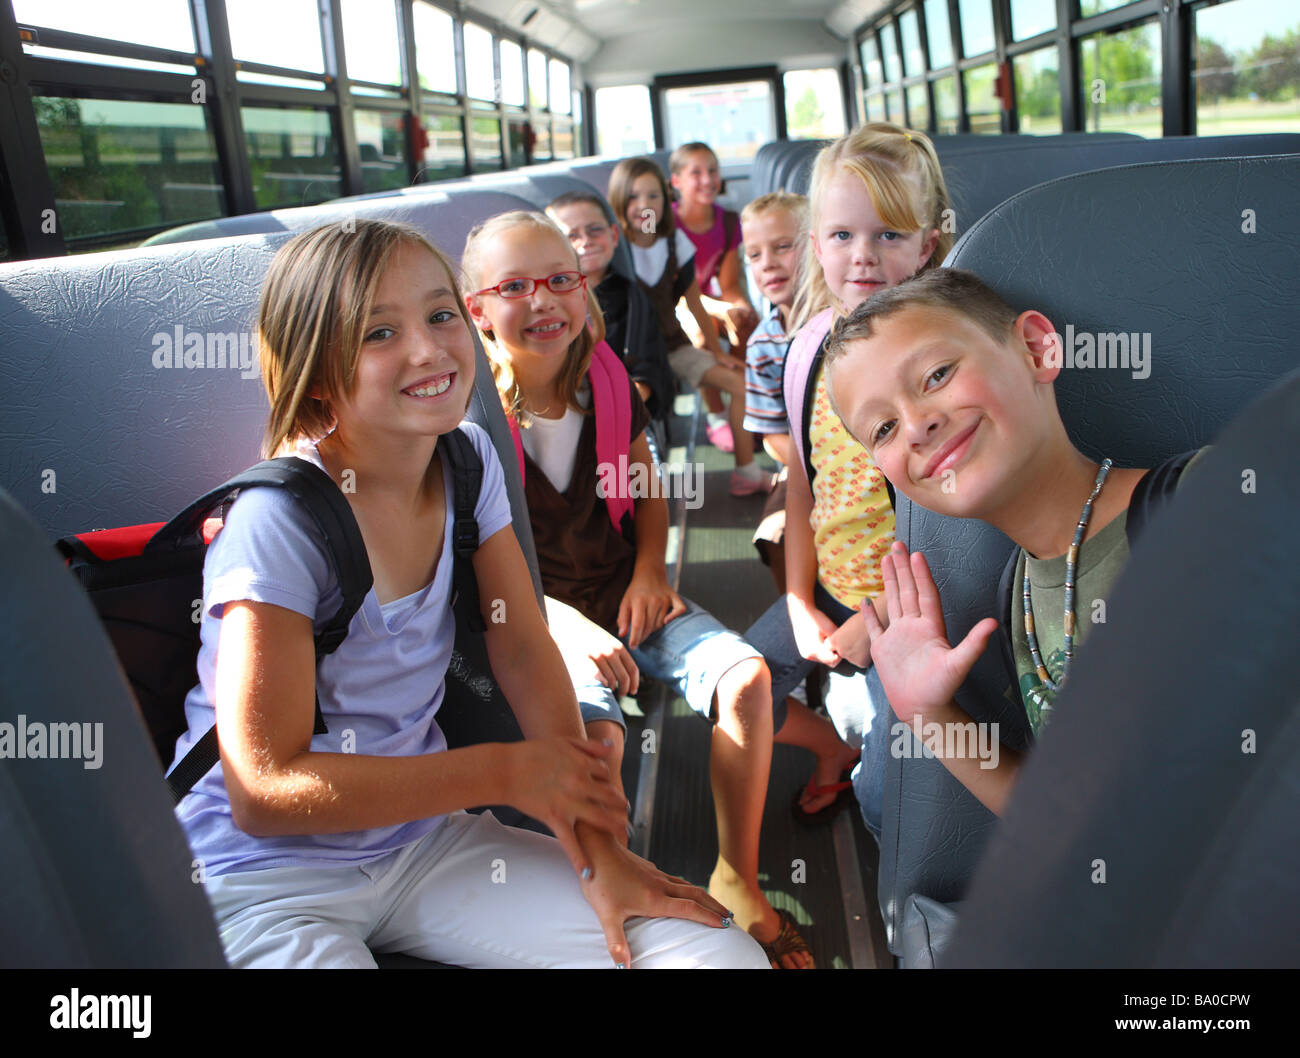 Group of school children on bus - Stock Image